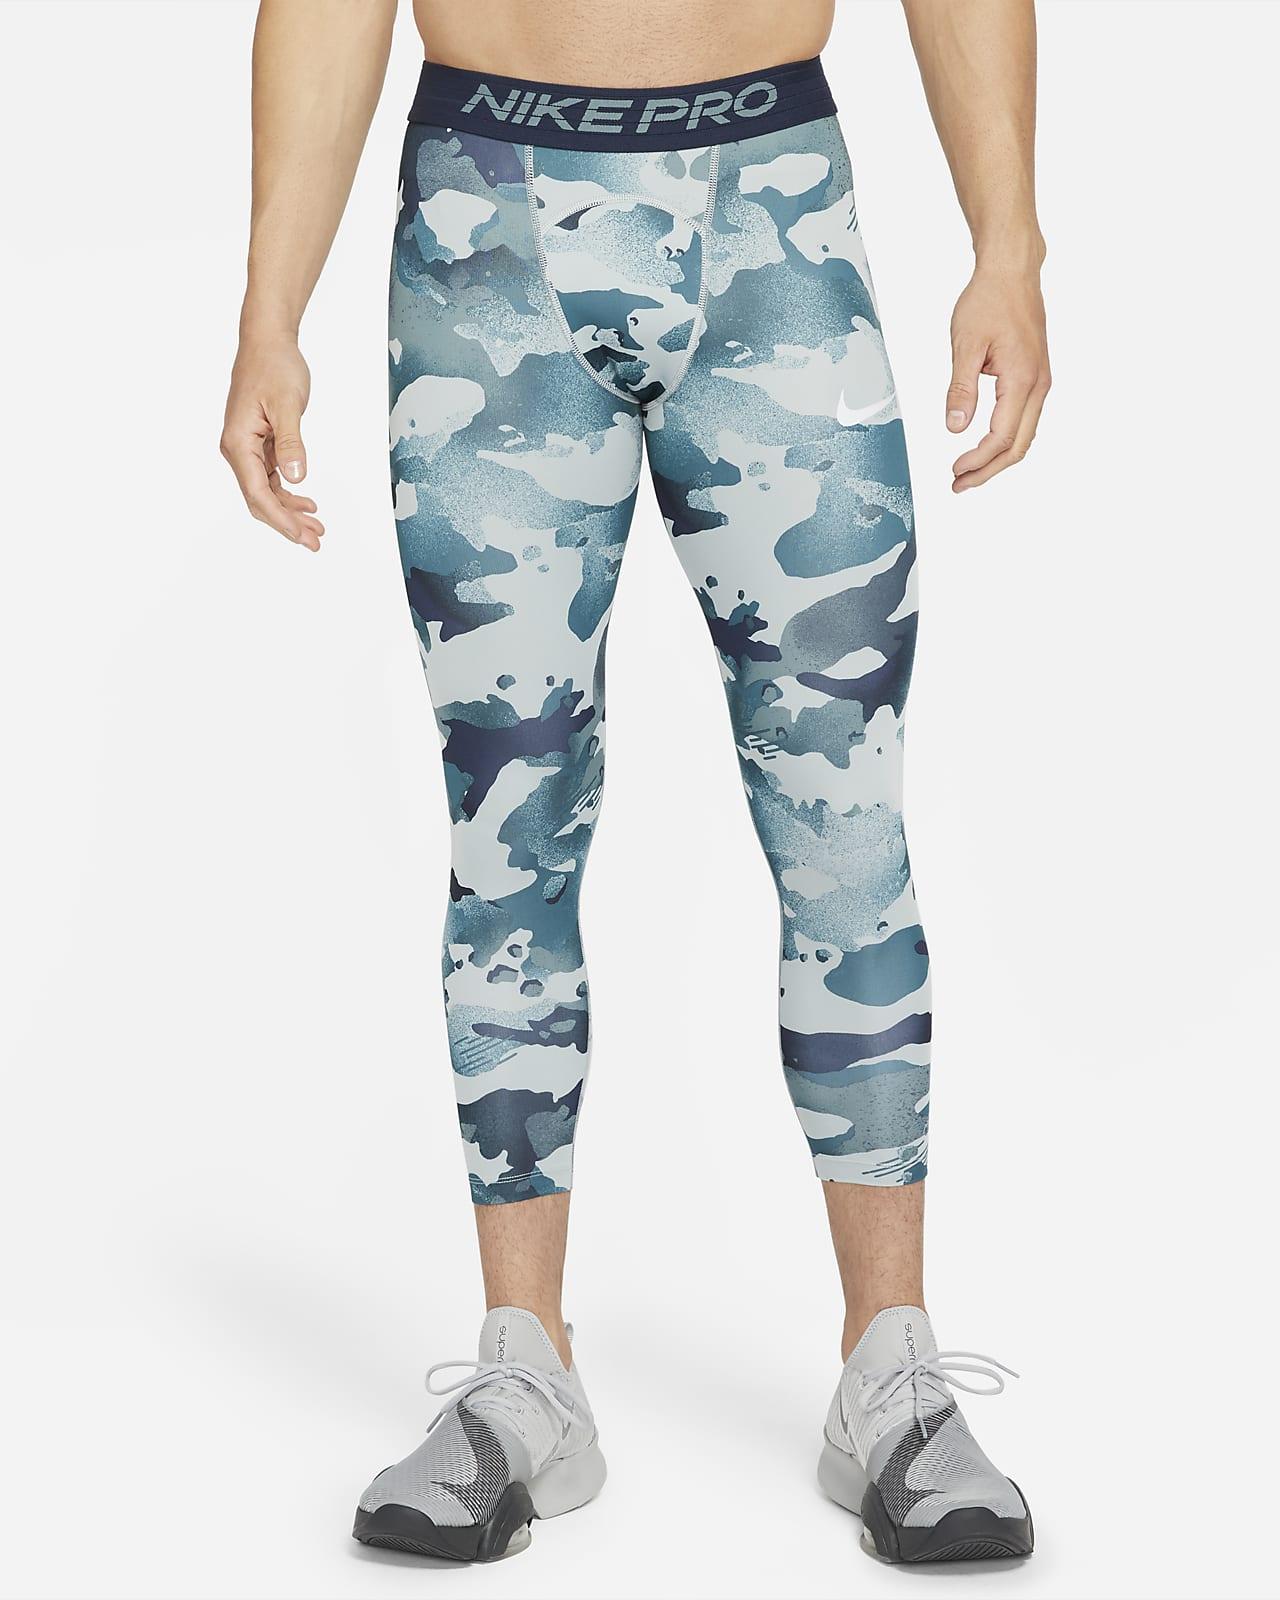 Legging 3/4 camouflage Nike Pro pour Homme